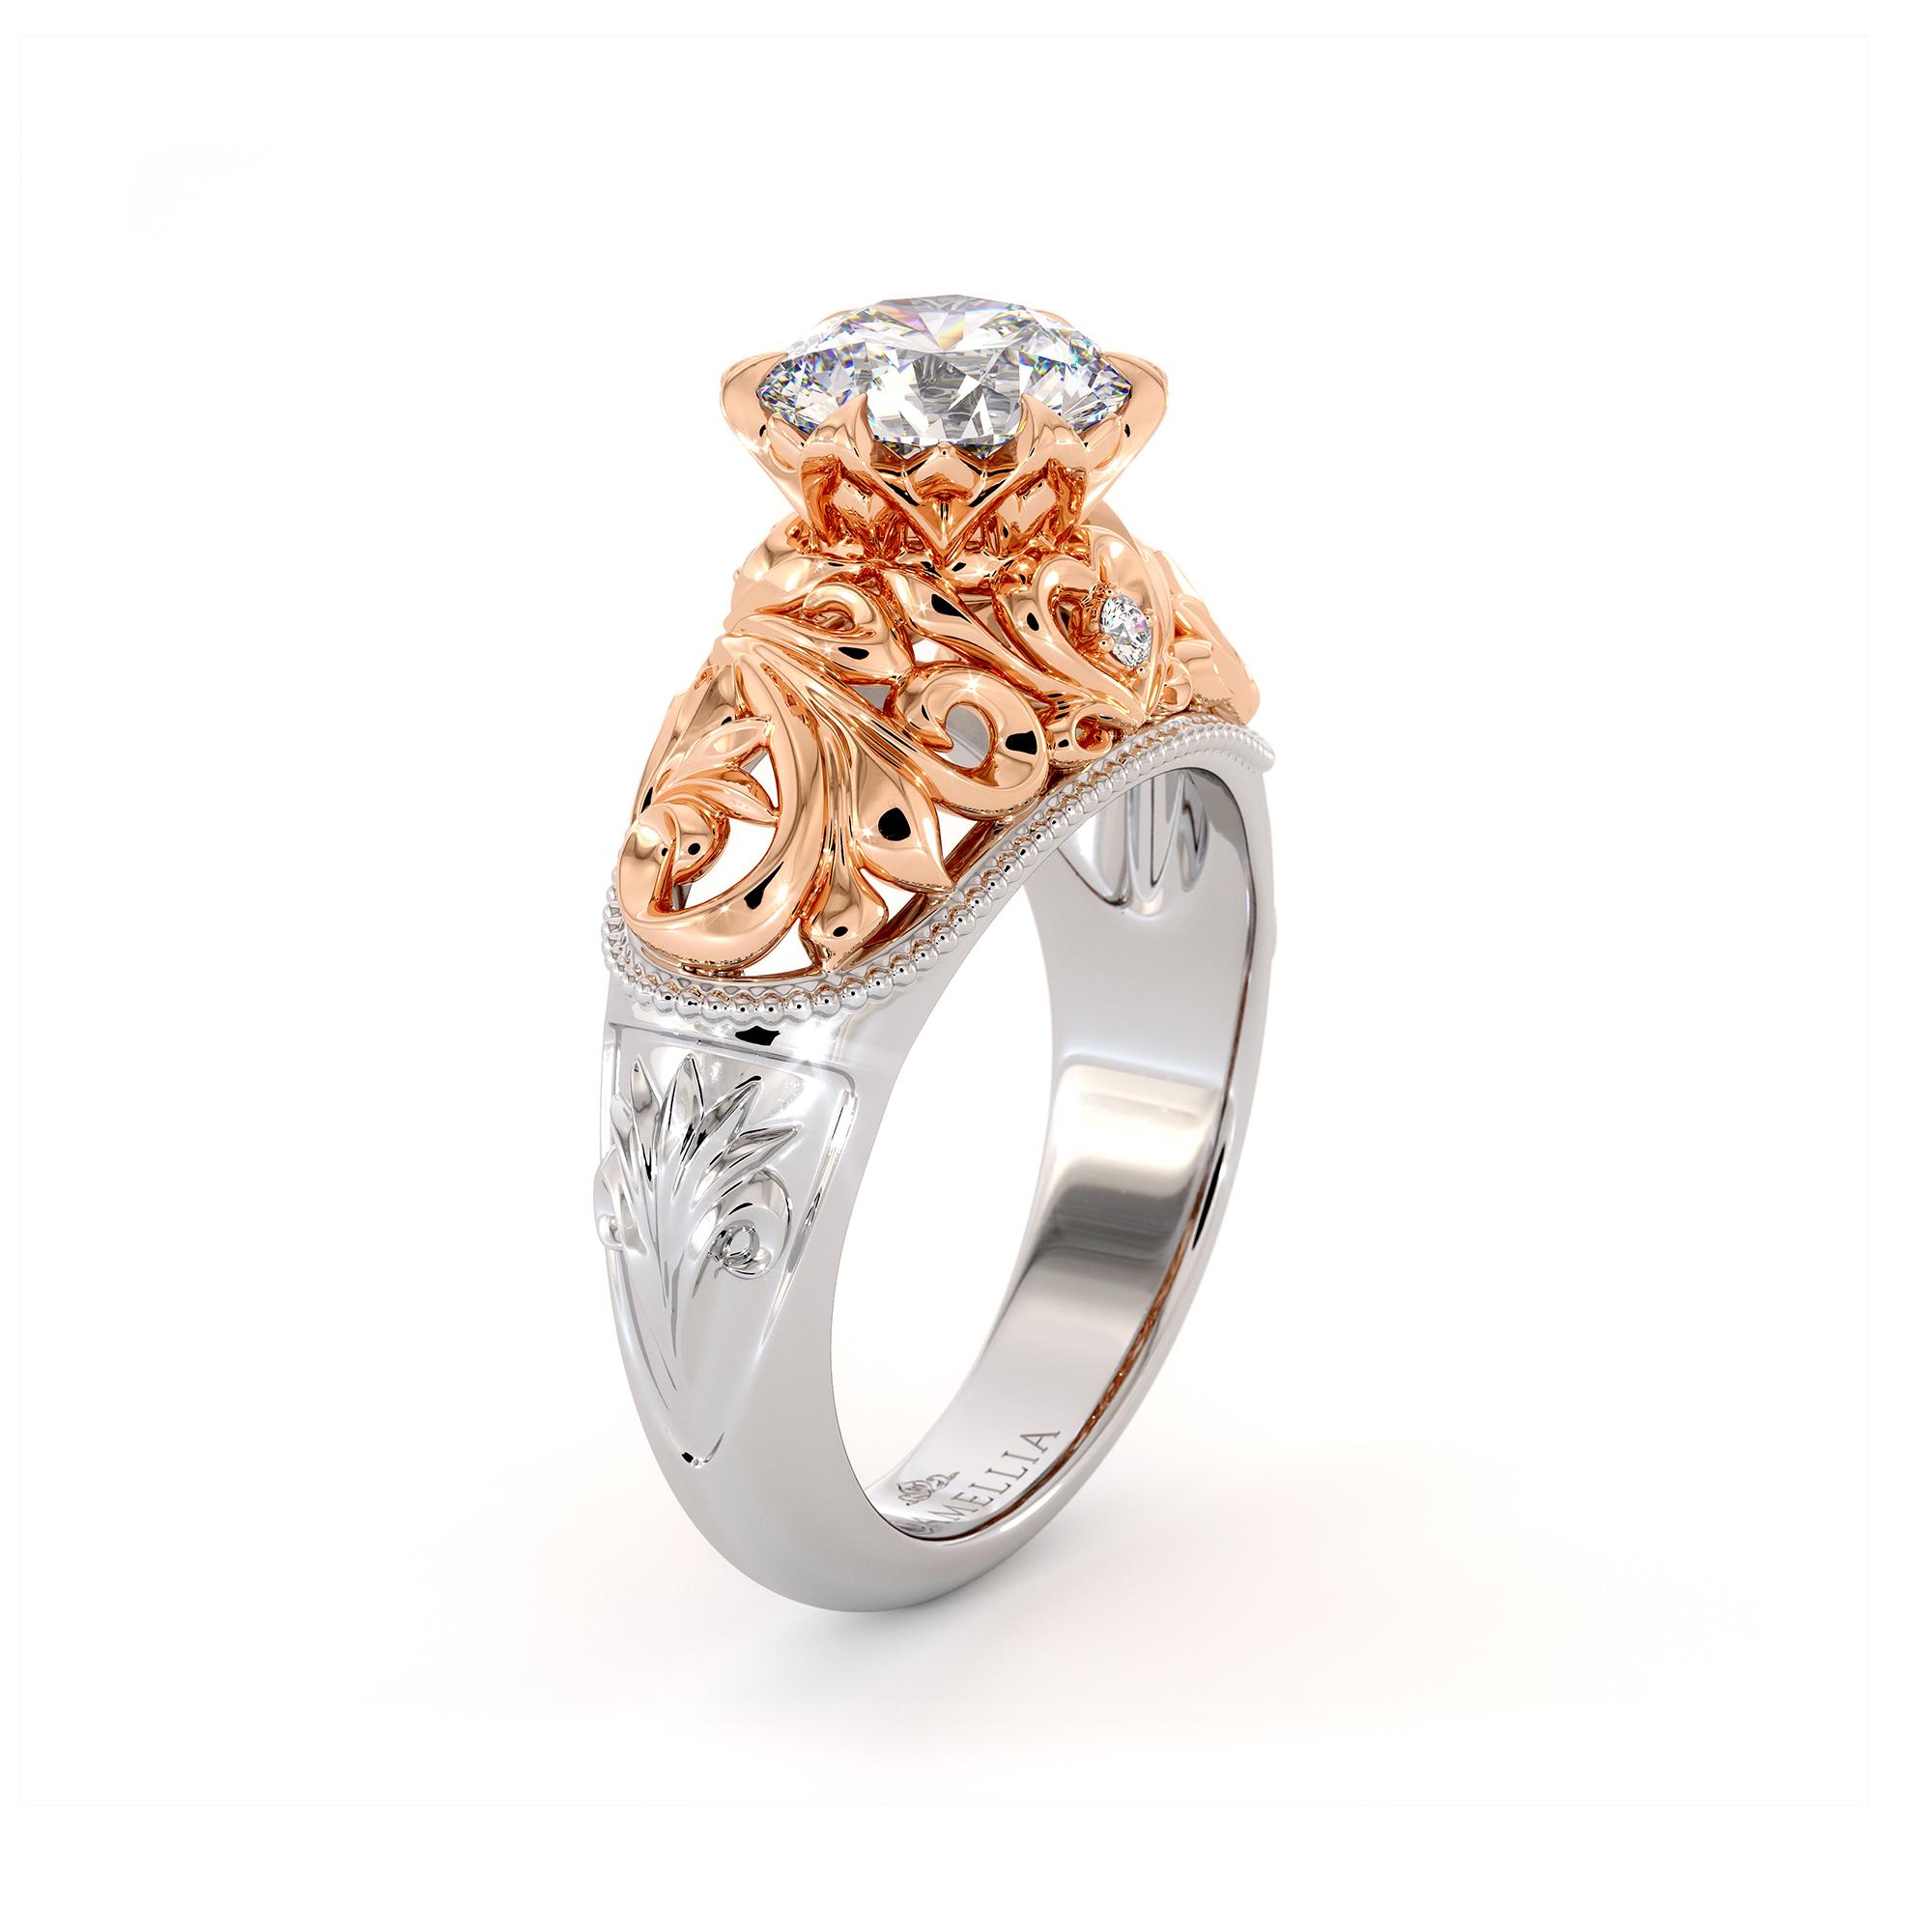 Art Nouveau Filigree Engagement Ring Royal Ring 1.55 Ct. Round Moissanite Ring Regal 2 Tone Gold Engagement Ring